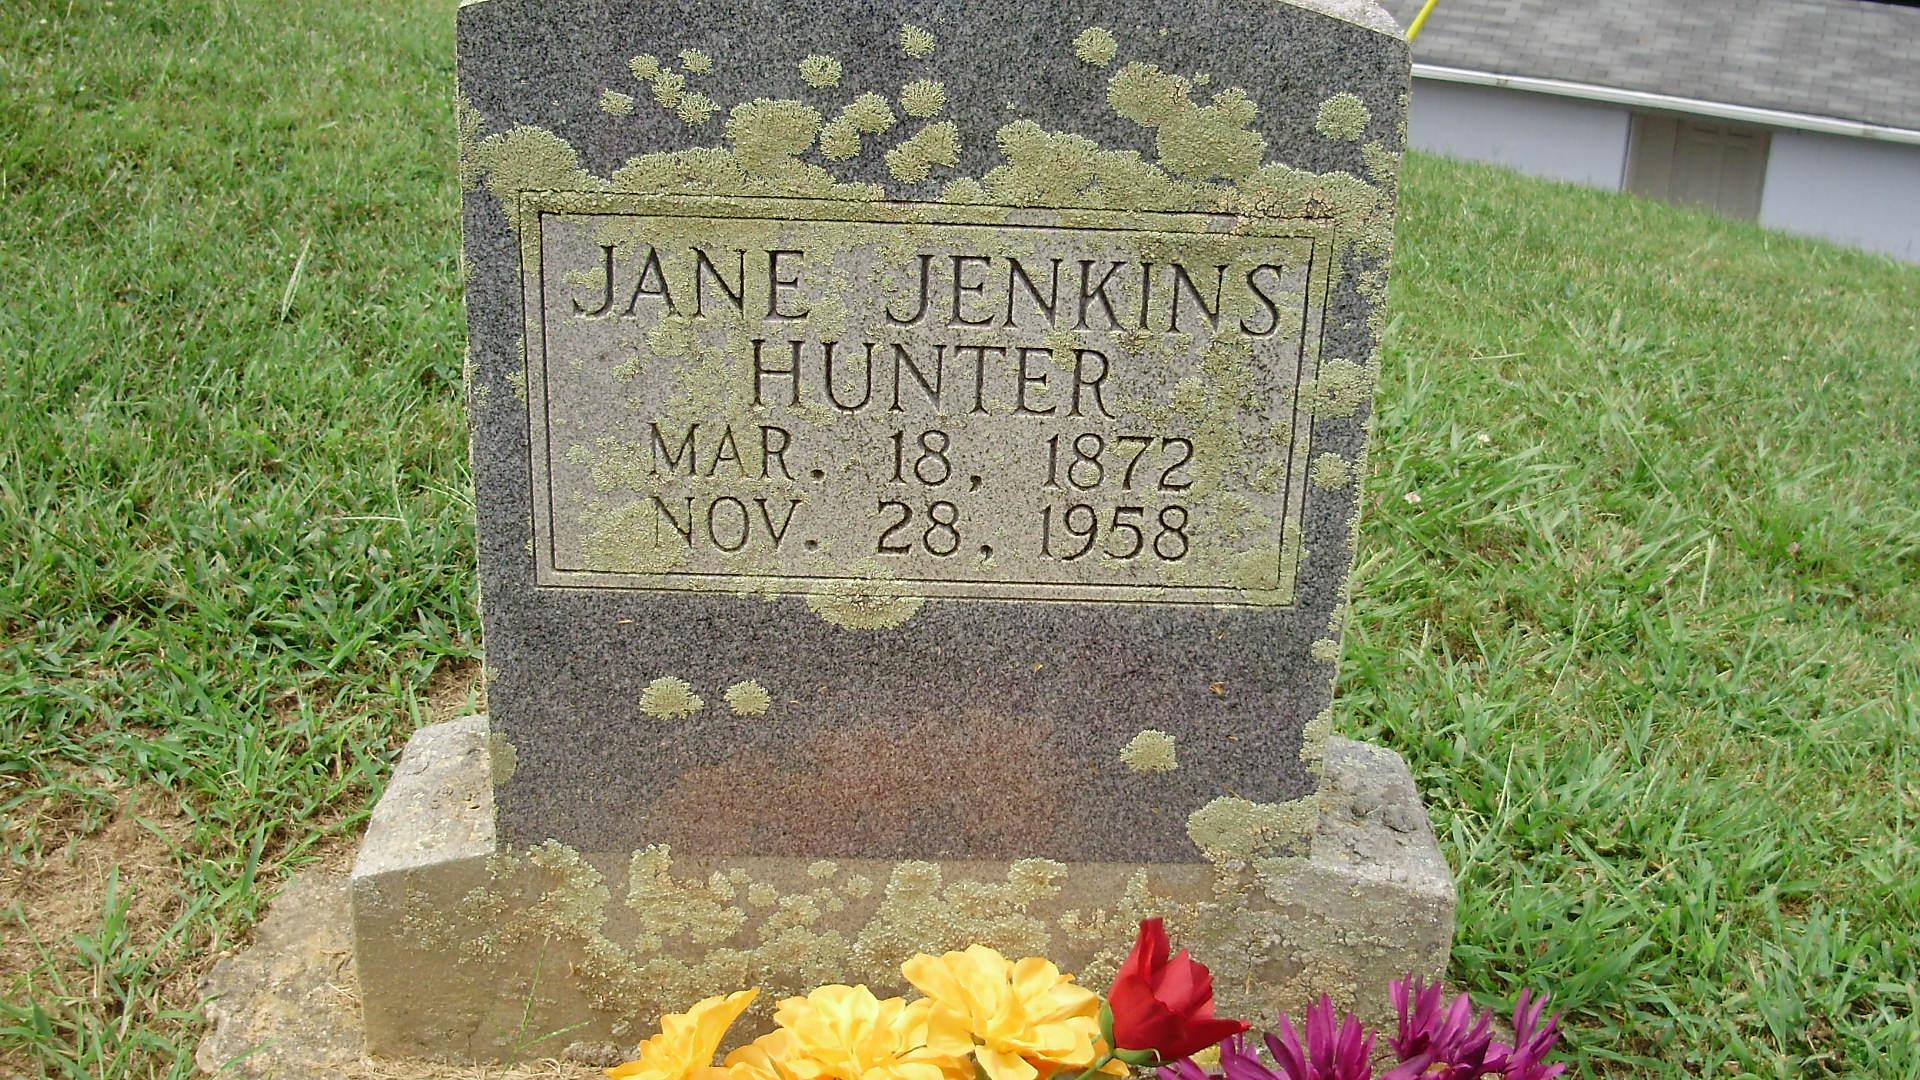 Jane Jenkins